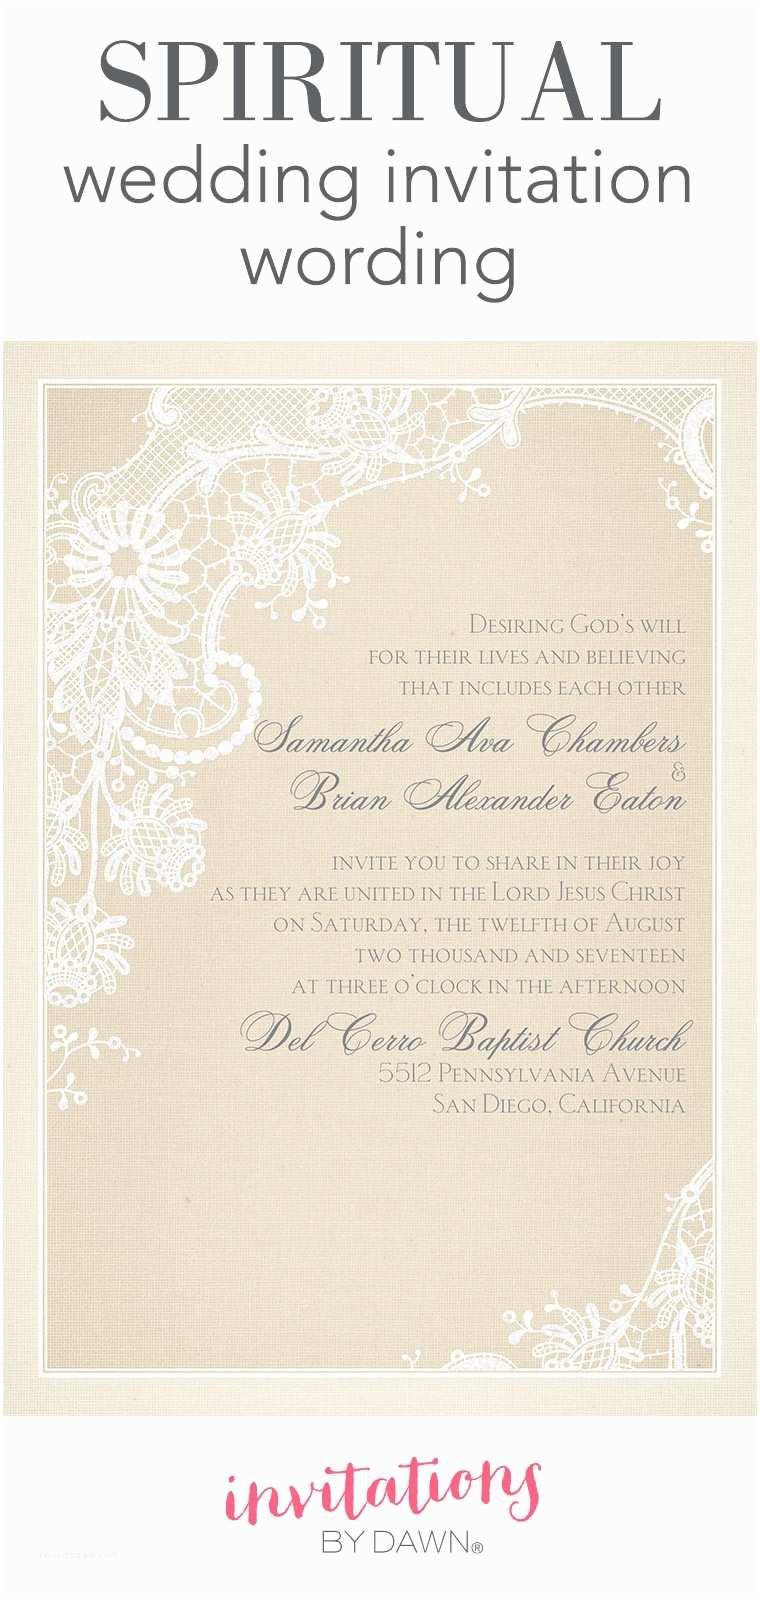 Religious Wedding Invitation Wording Christian Wedding Invitation Wording